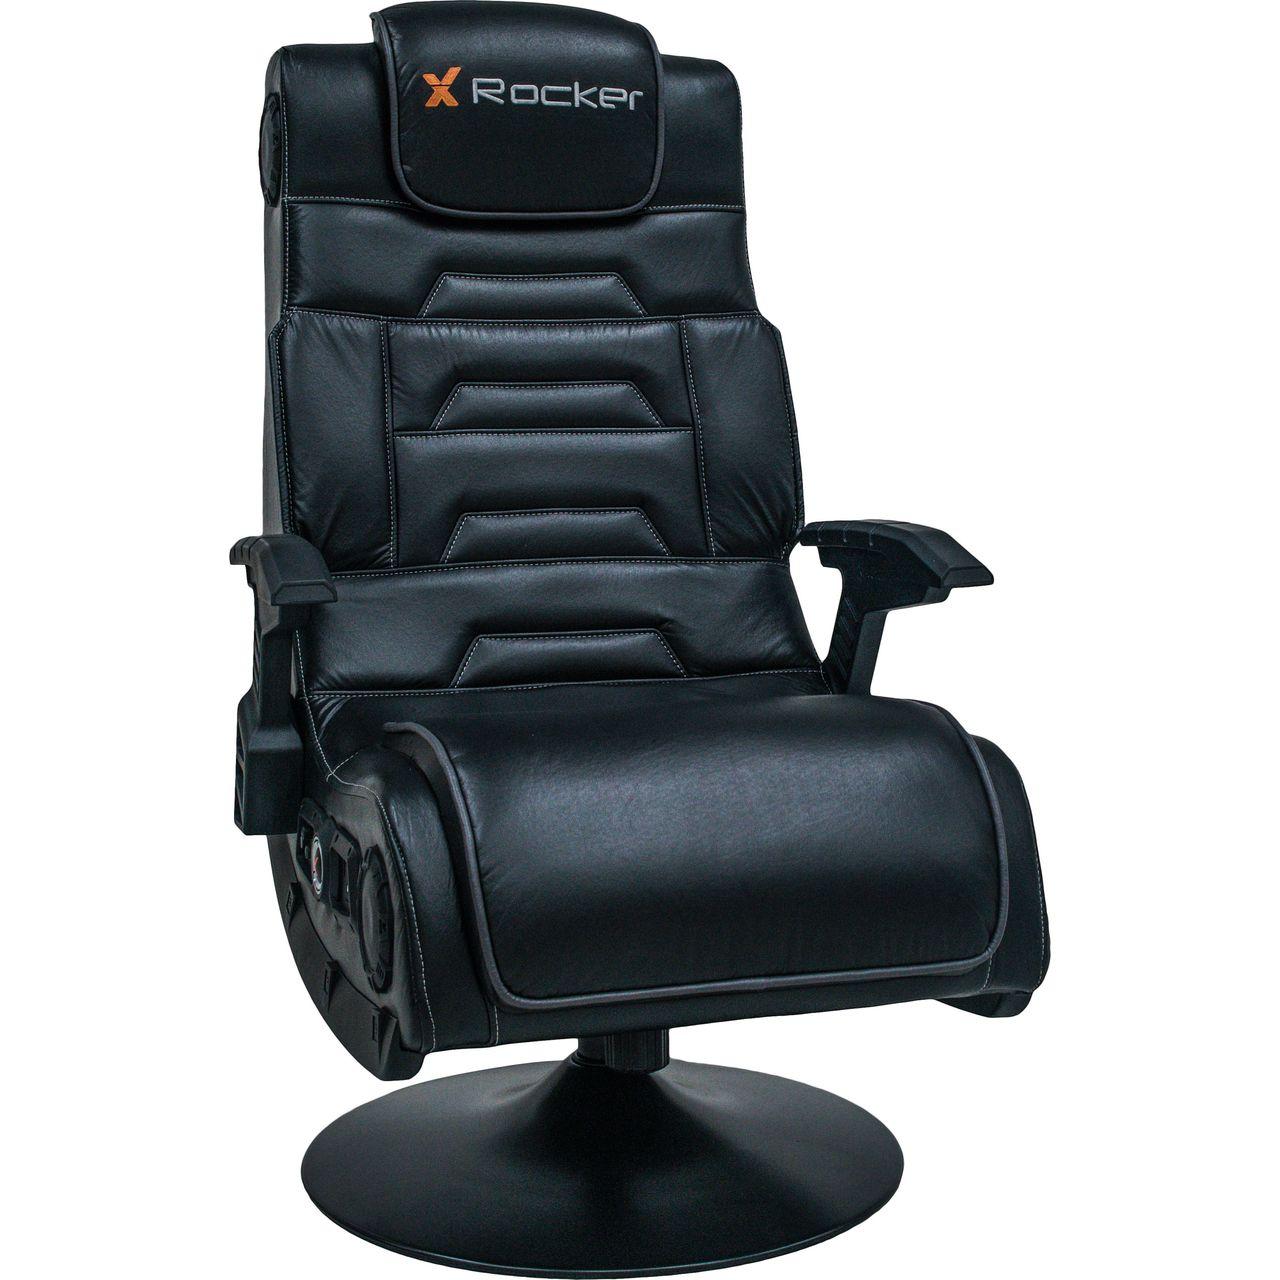 Terrific X Rocker Wireless Pro 4 1 Gaming Chair Black Uwap Interior Chair Design Uwaporg